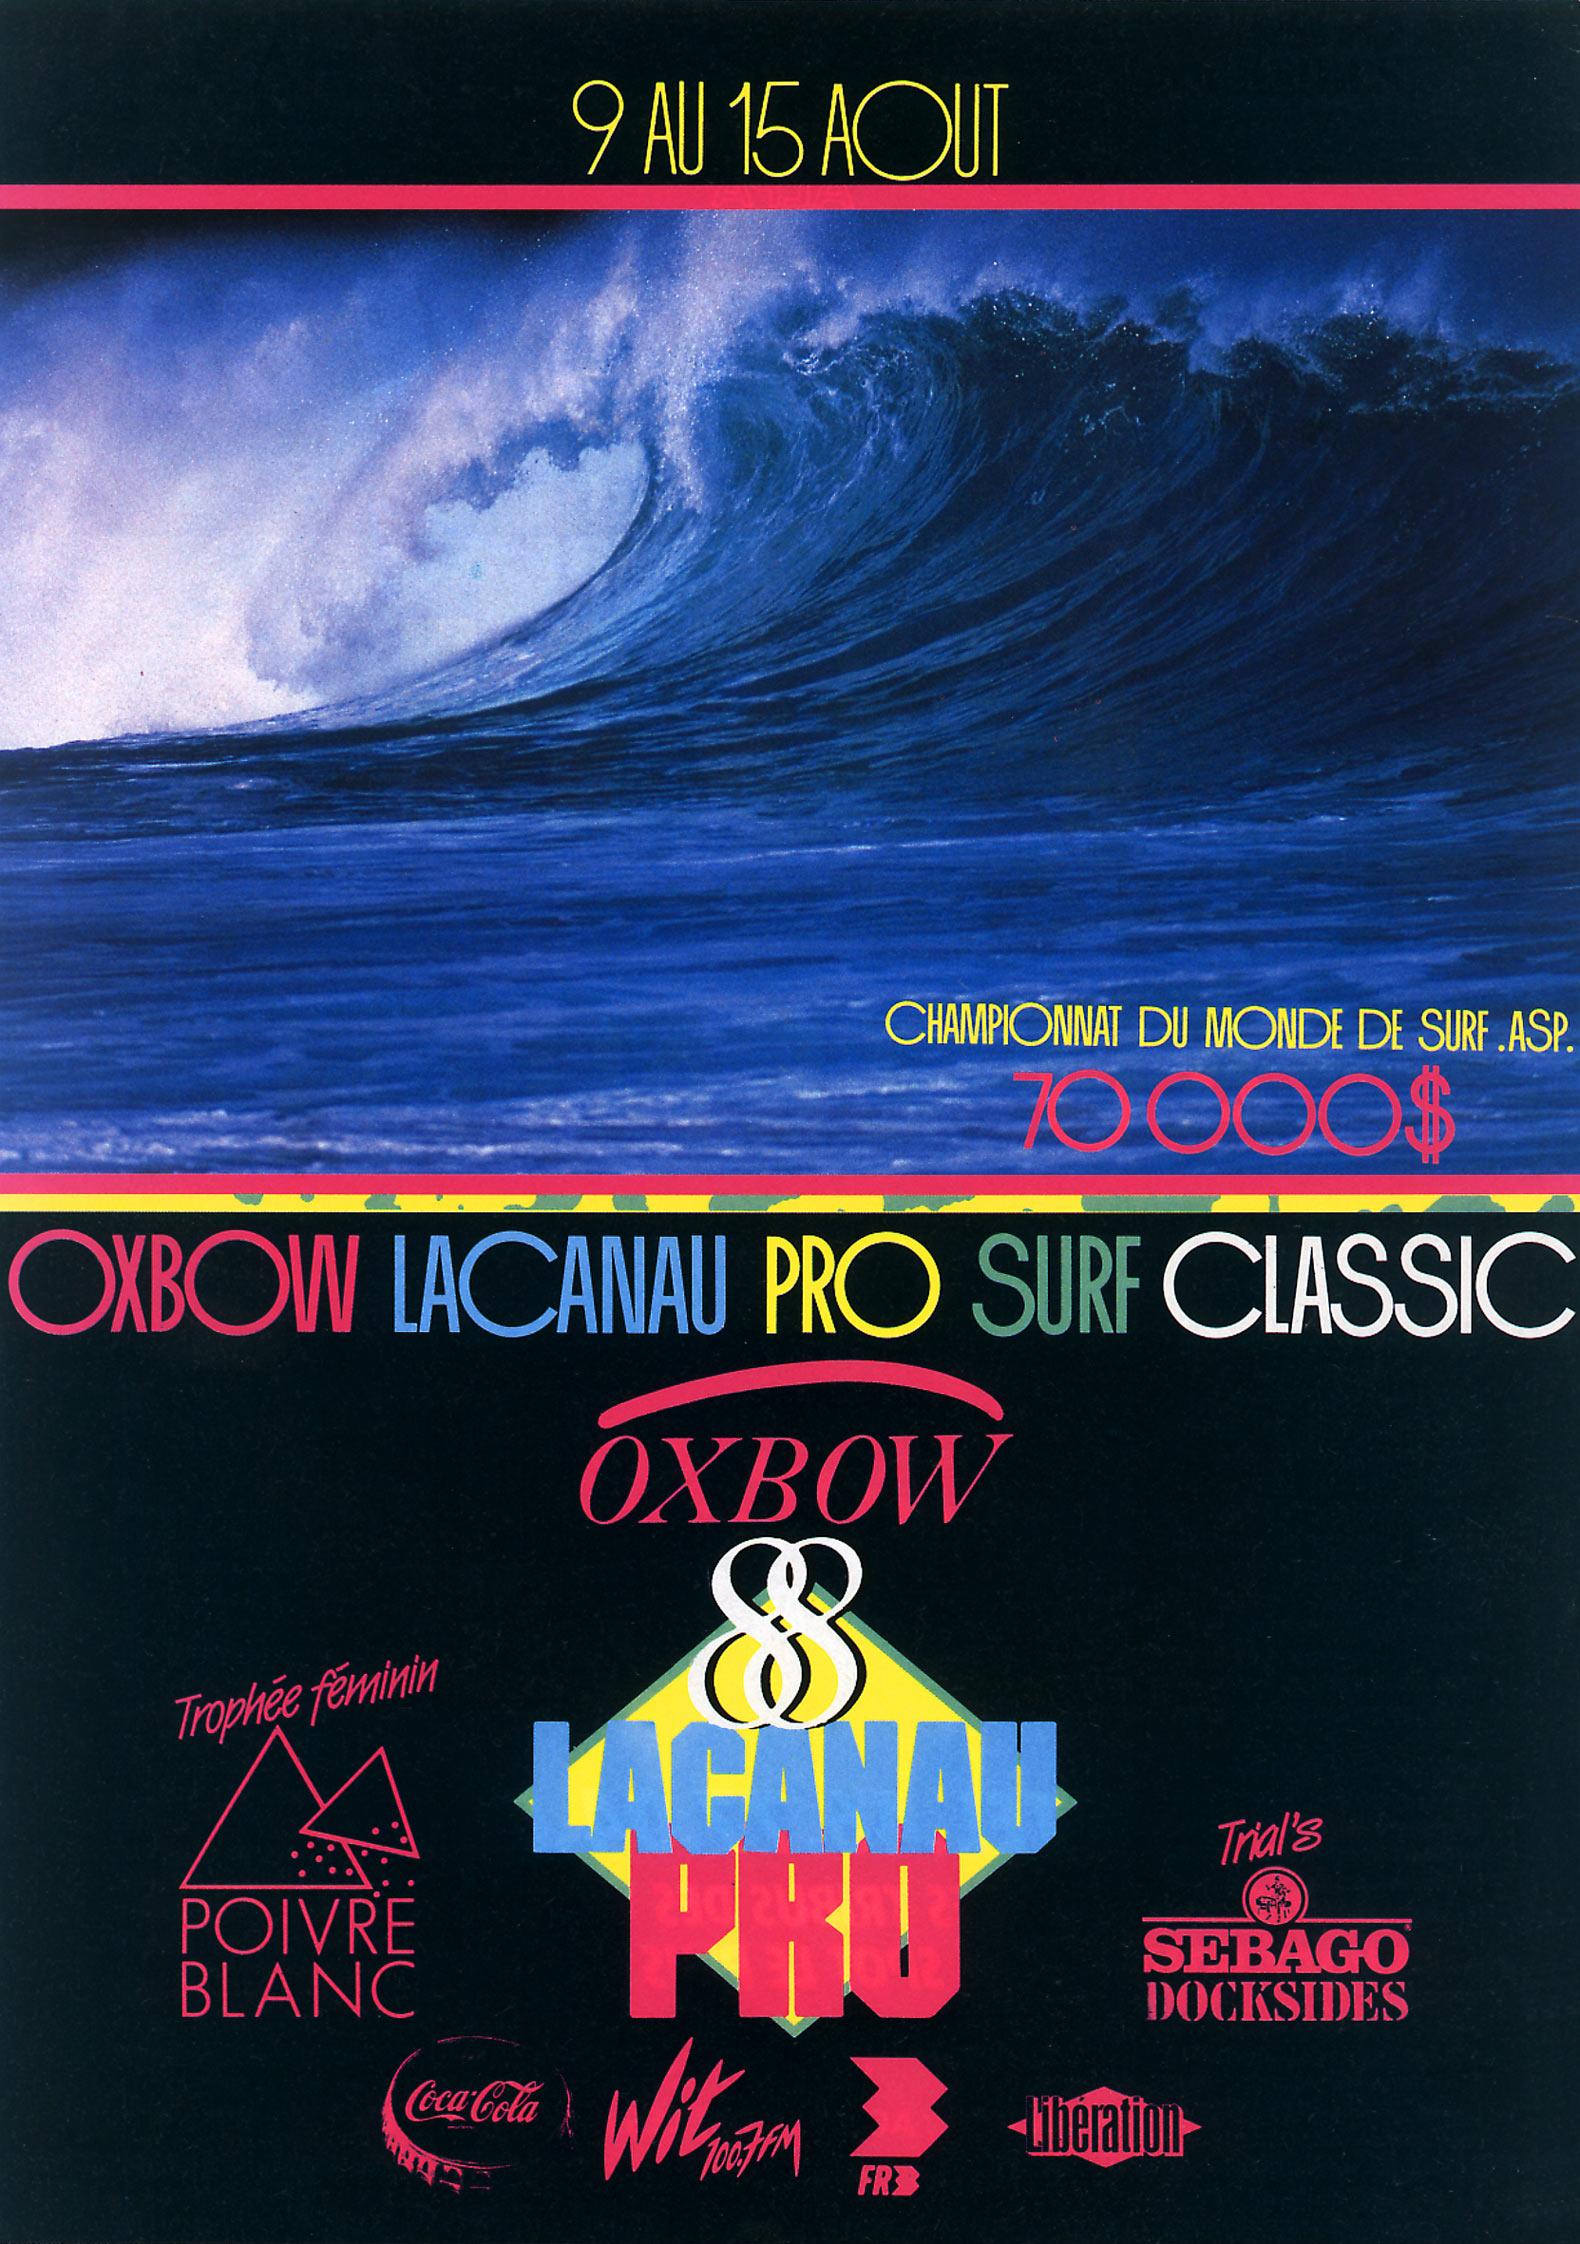 Oxbow-lacanau-pro-1988_1